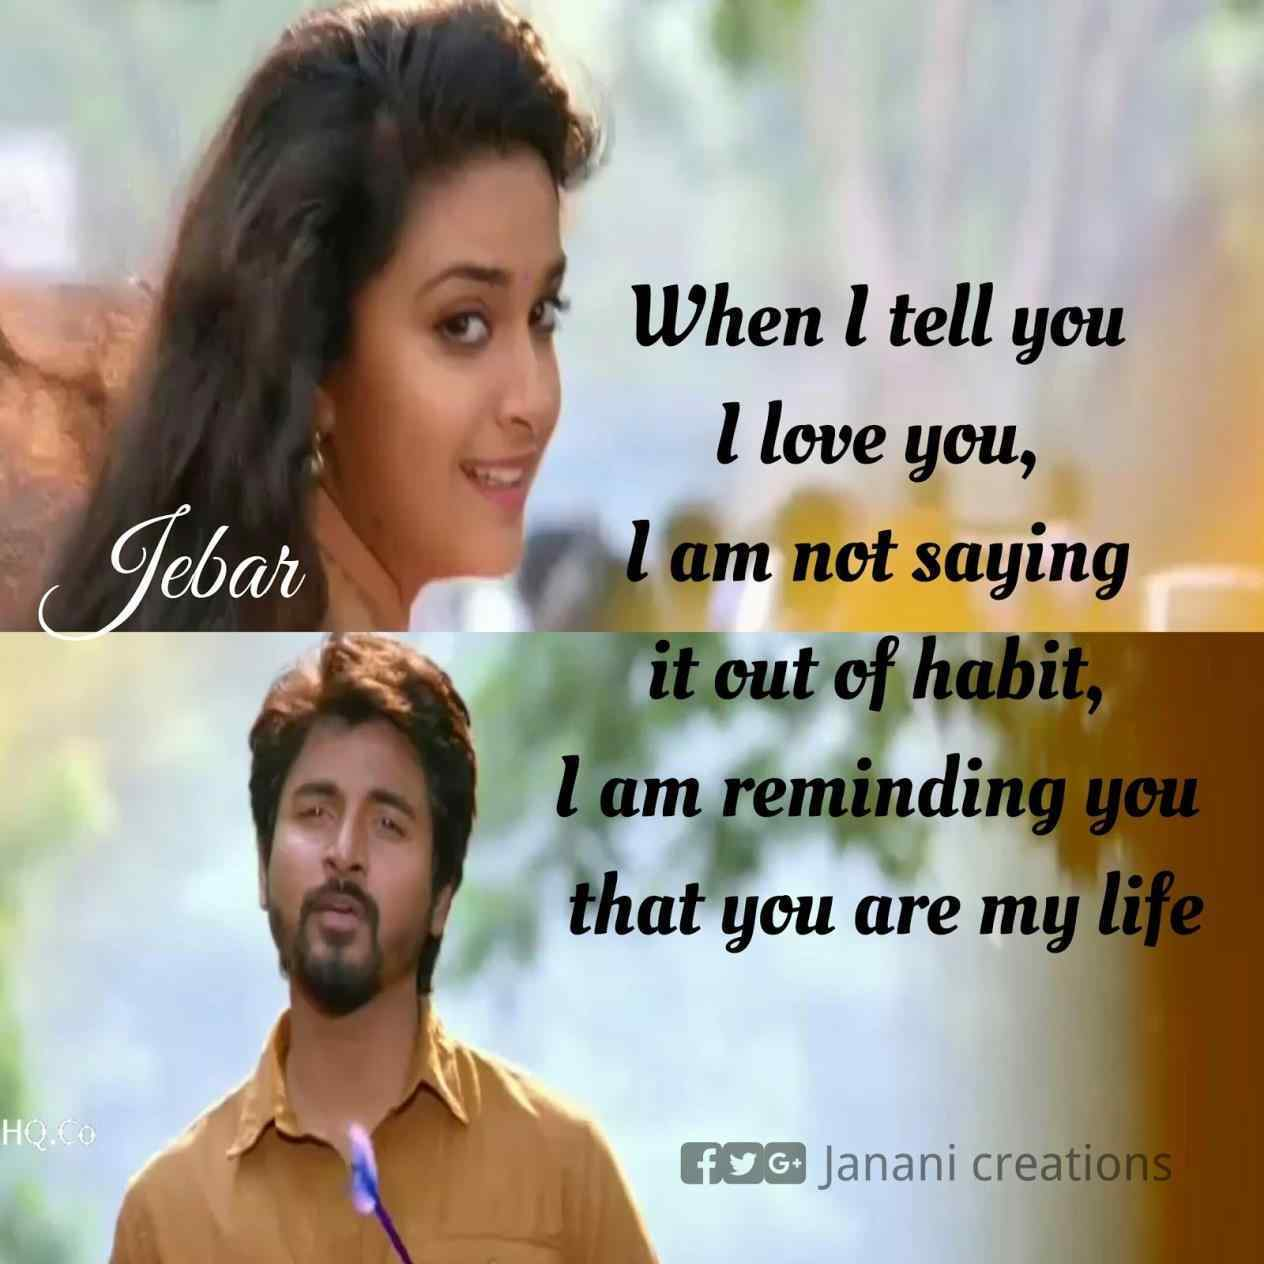 Movie Heart Touching U Kavi Gal Heart Love Quotes For Wife In Tamil Touching Love Quotes In Tamil U Kavi Gal Husbend And Wife